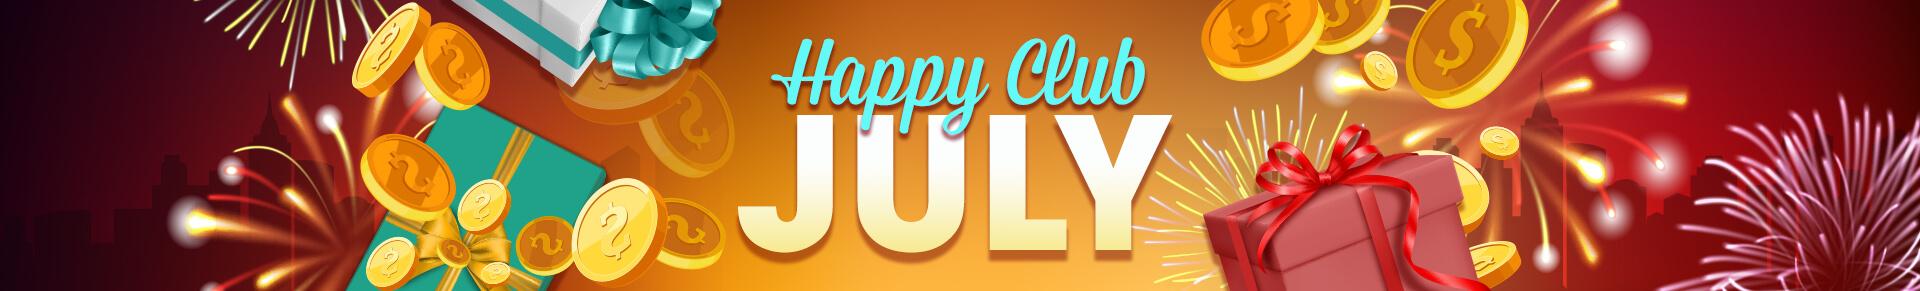 Happi Club July